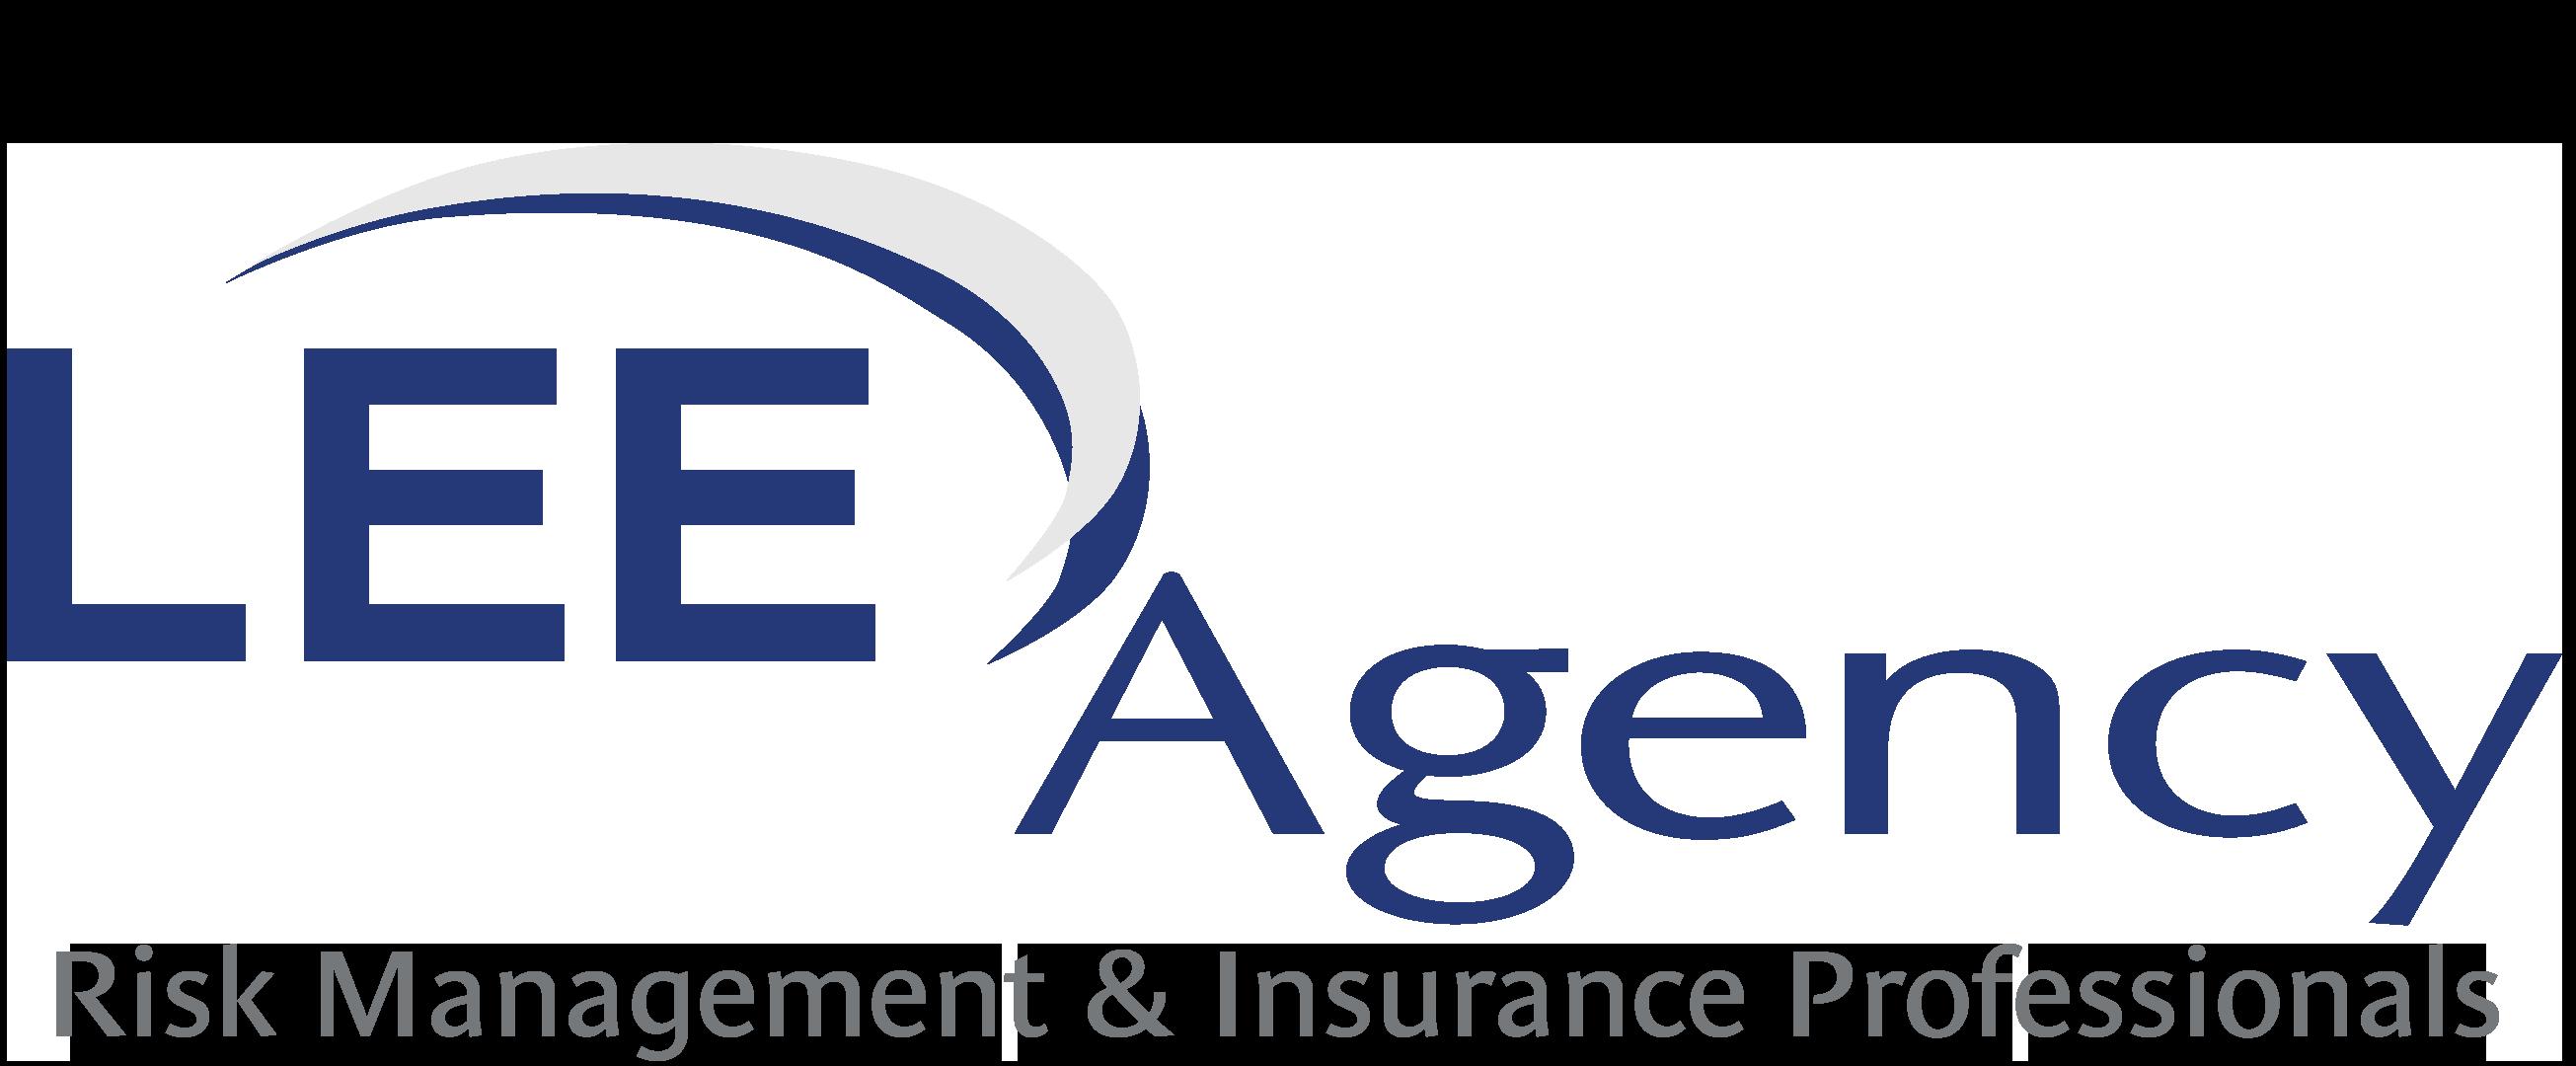 Lee_RiskManagement&InsuranceProfessionals